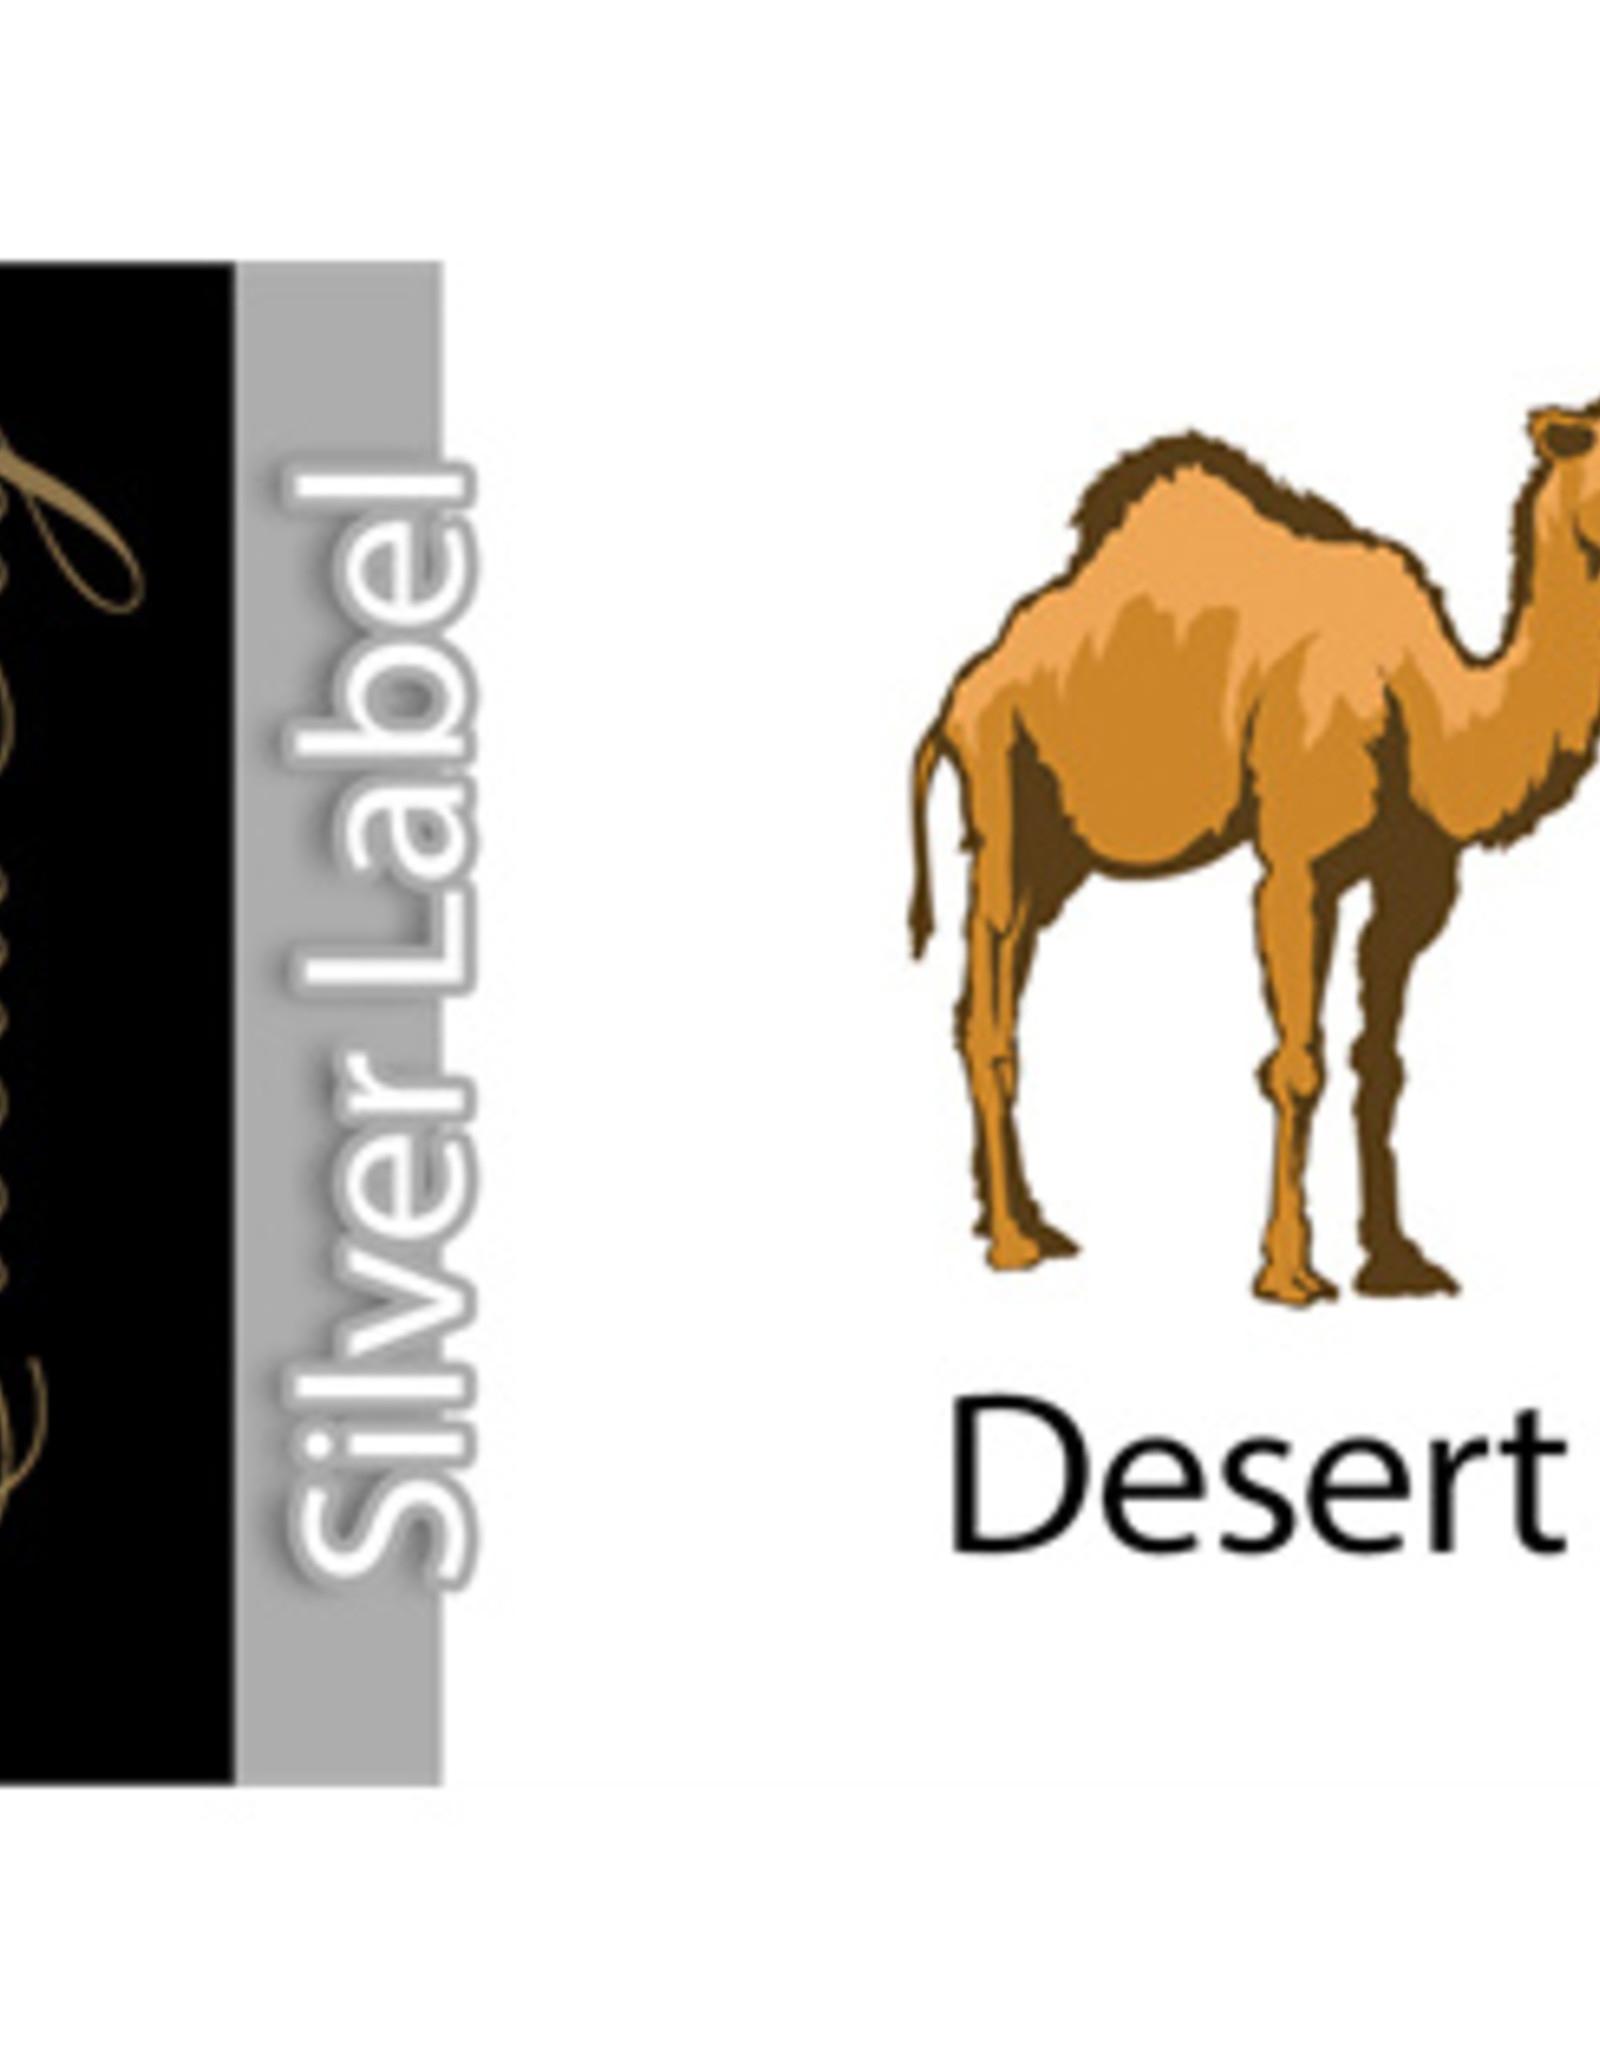 Exclucig Exclucig Silver Label E-liquid Desert 18 mg Nicotine